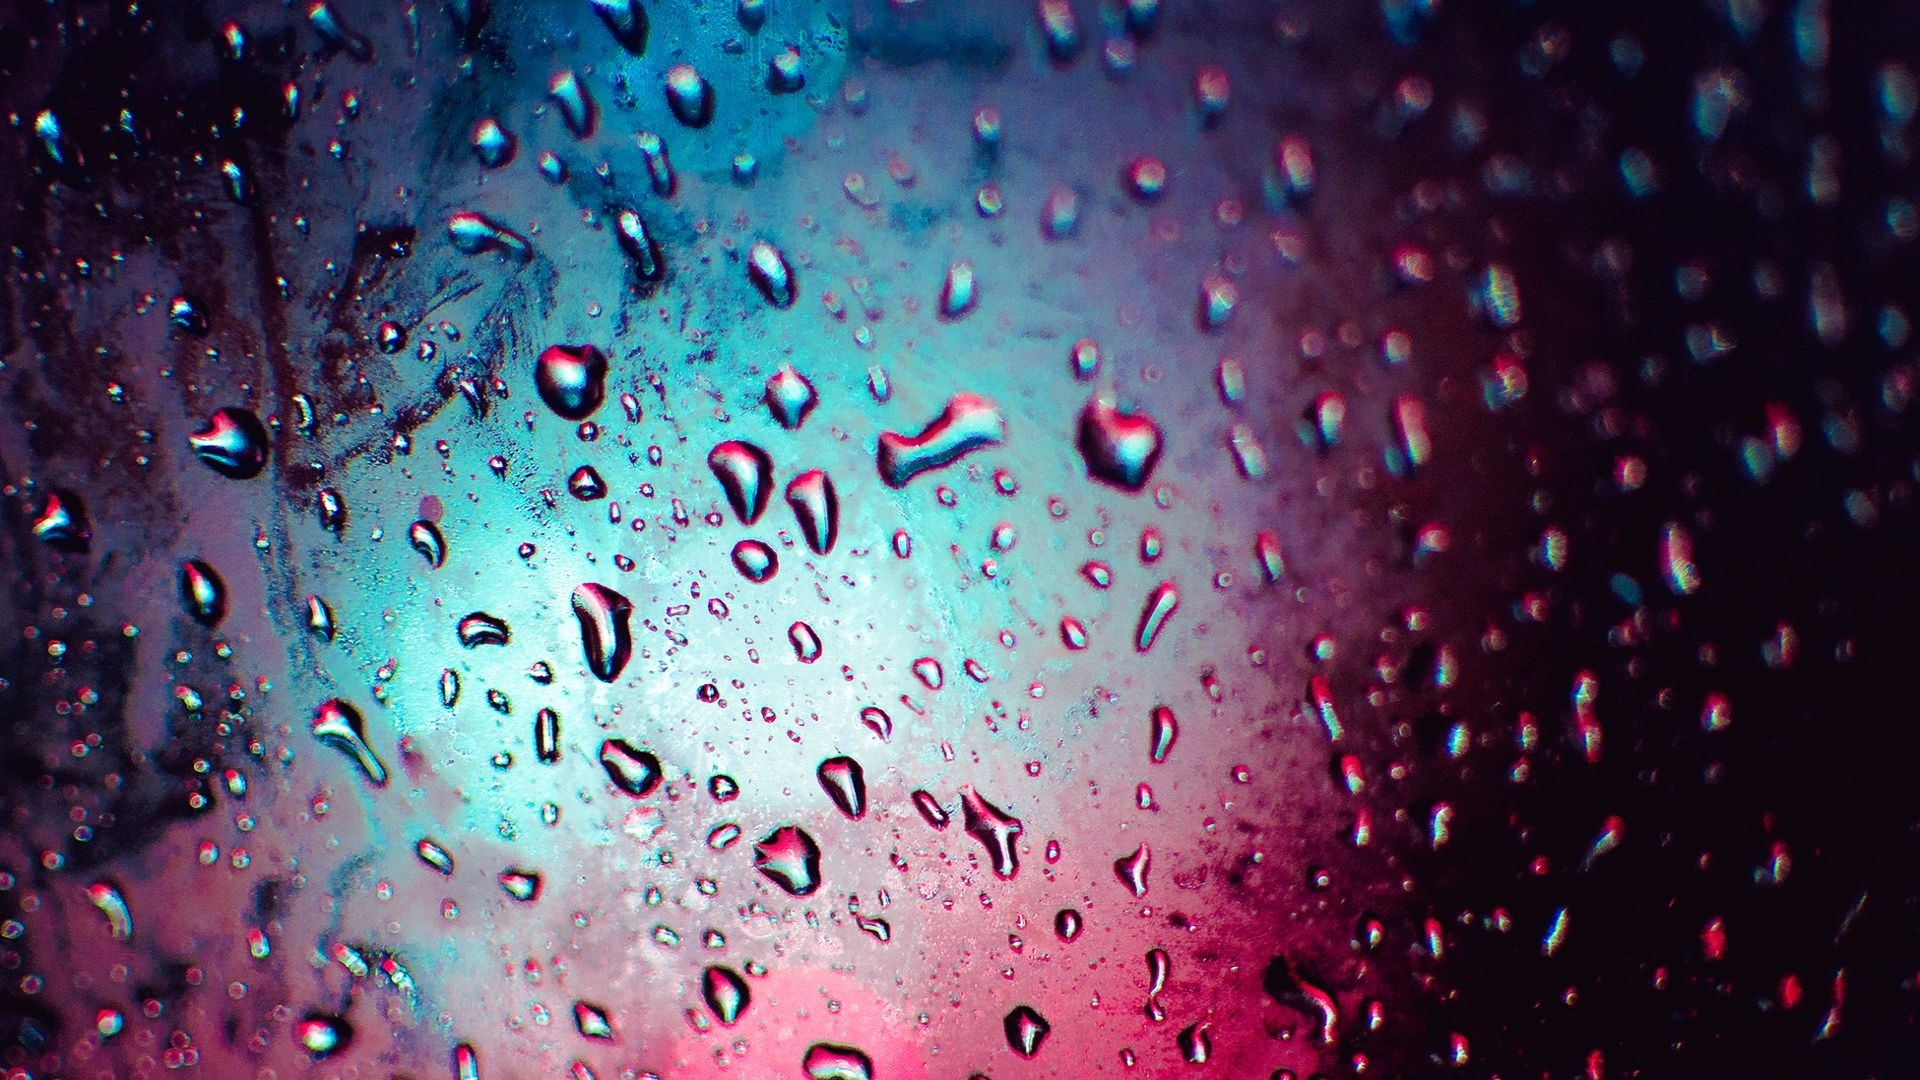 макро,стекло,вода,свет  № 1192865 бесплатно